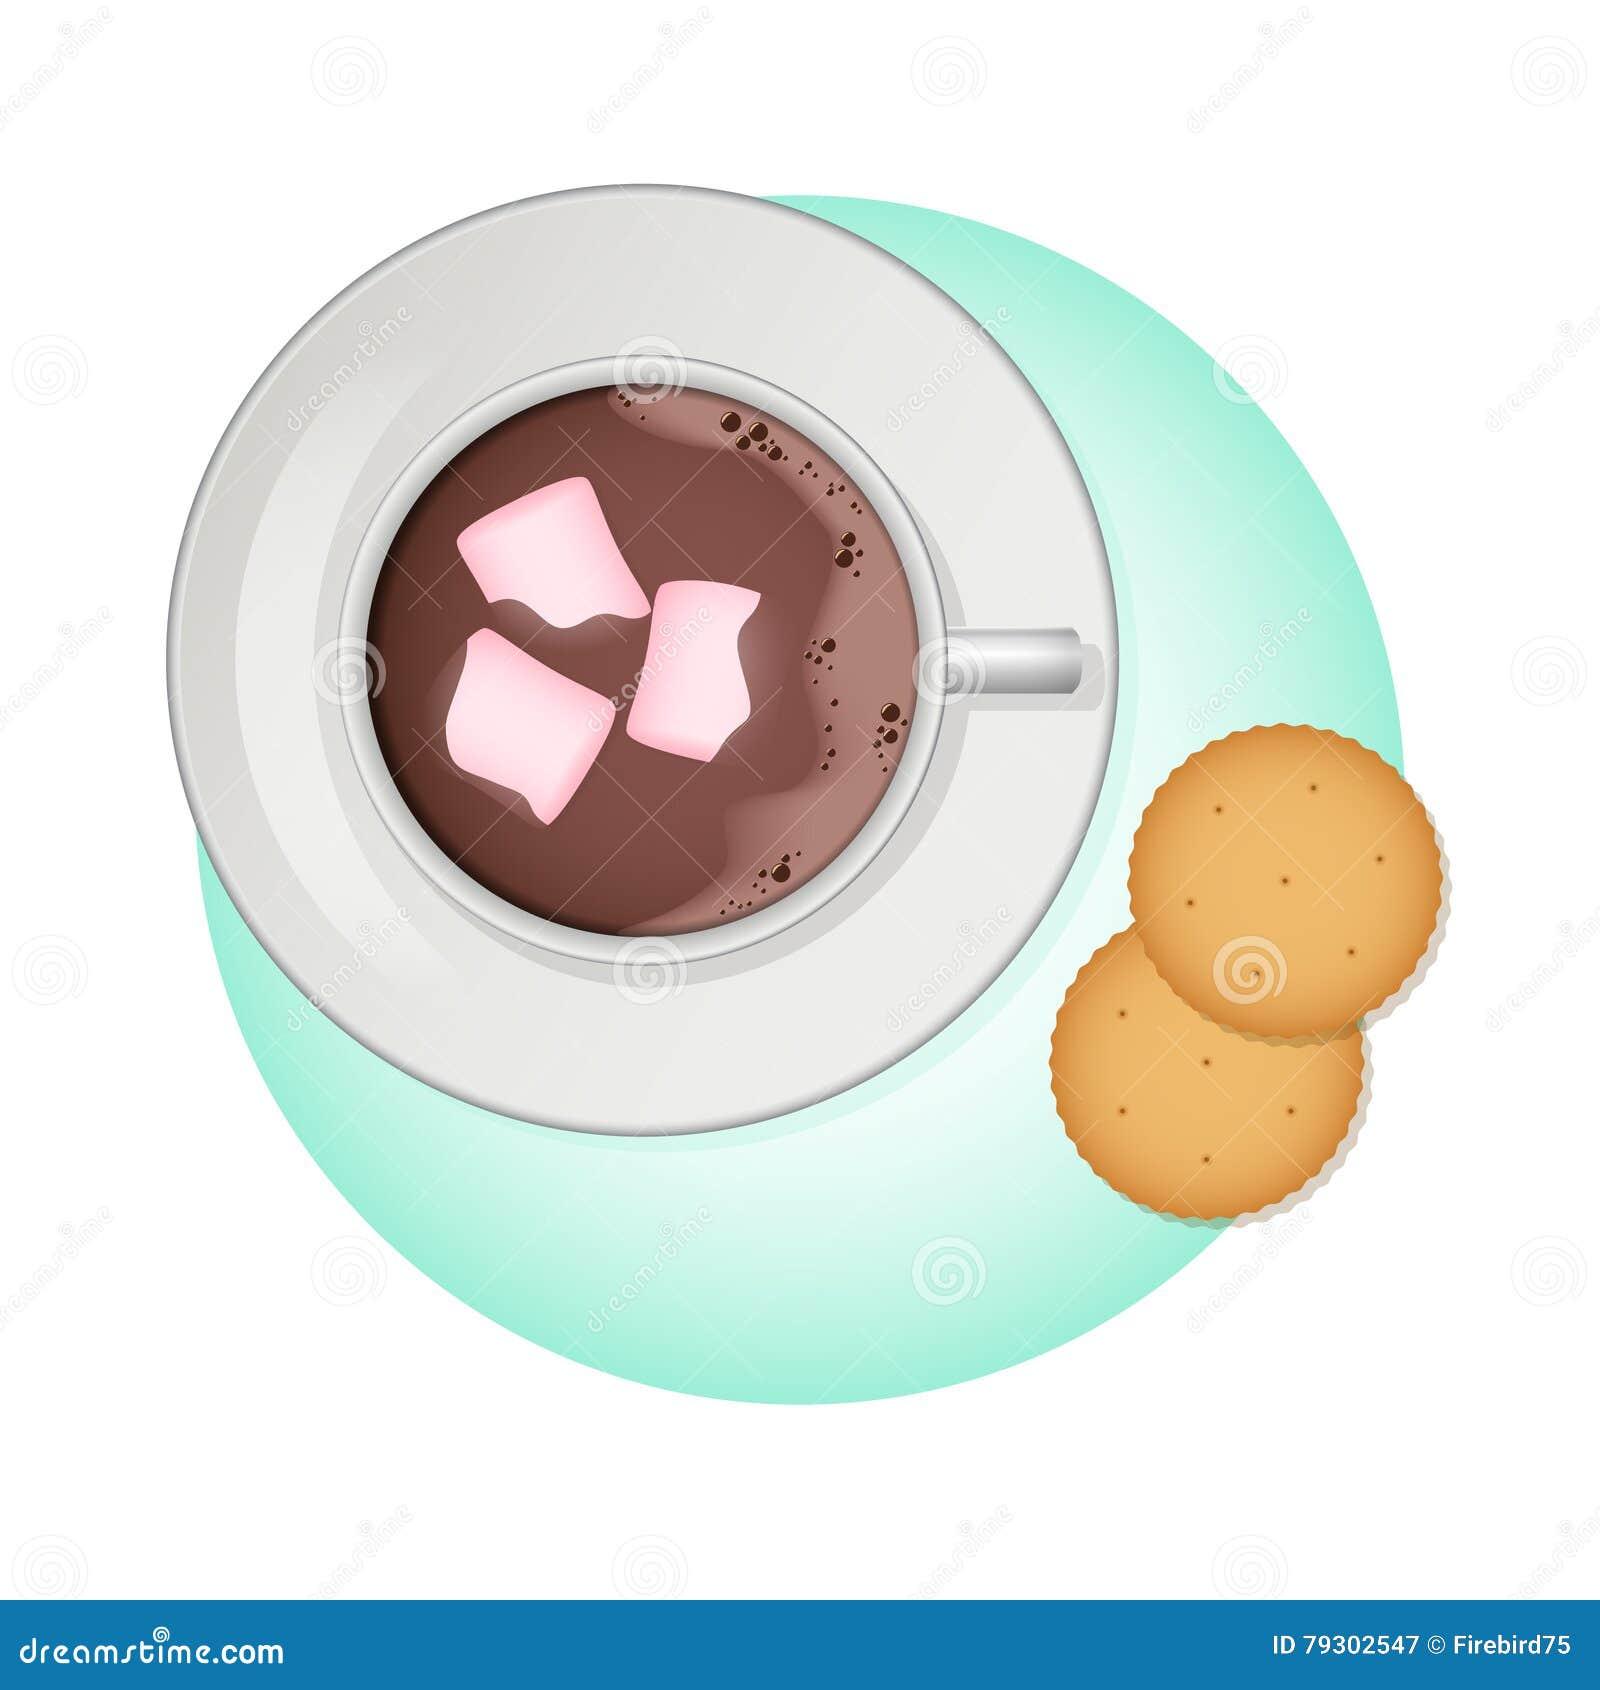 cocoa pink cporder cporder cocoa pink - cocoa pink